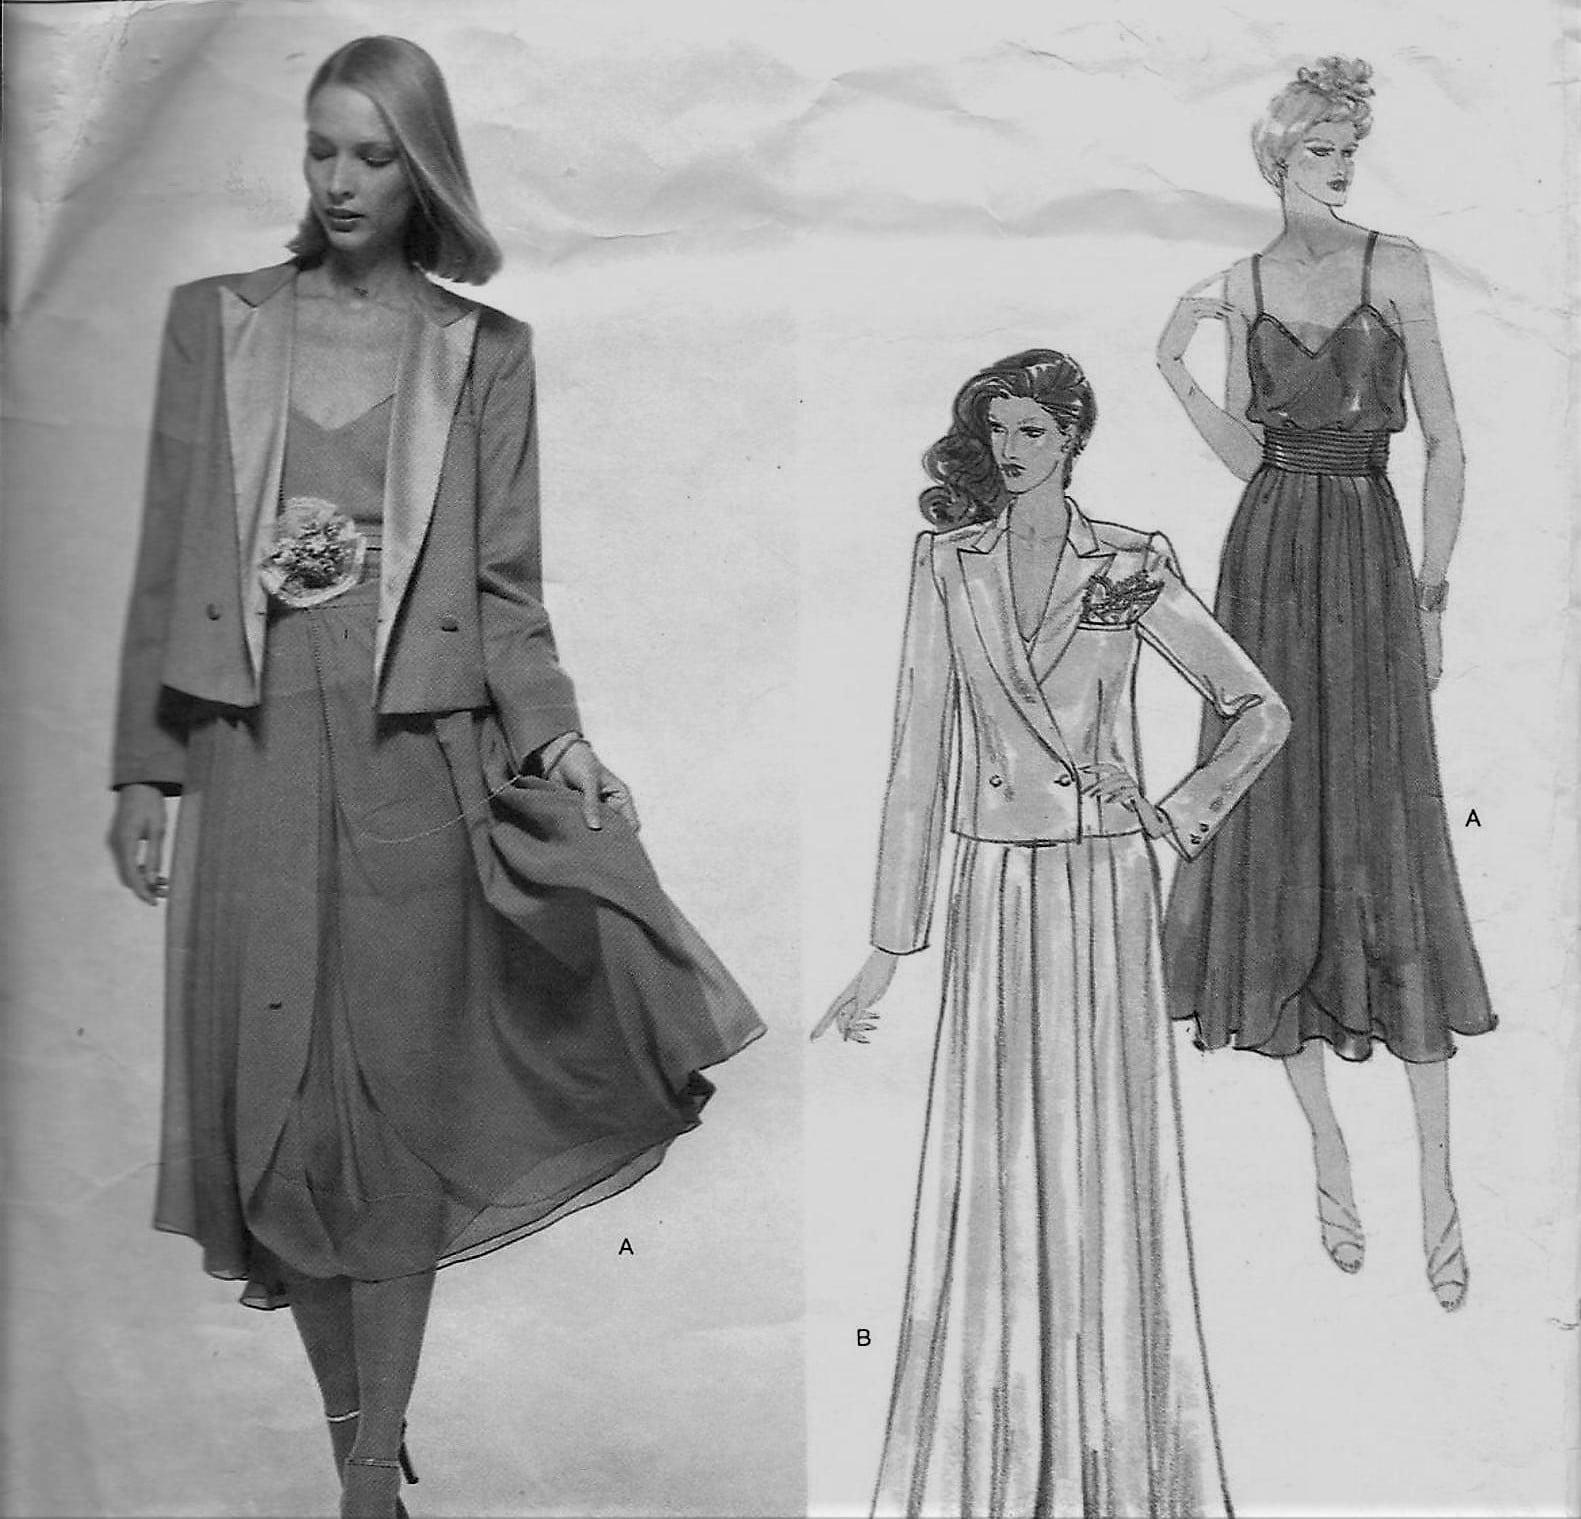 Zabójstwo Versace - projekt Genny Versace (80's)